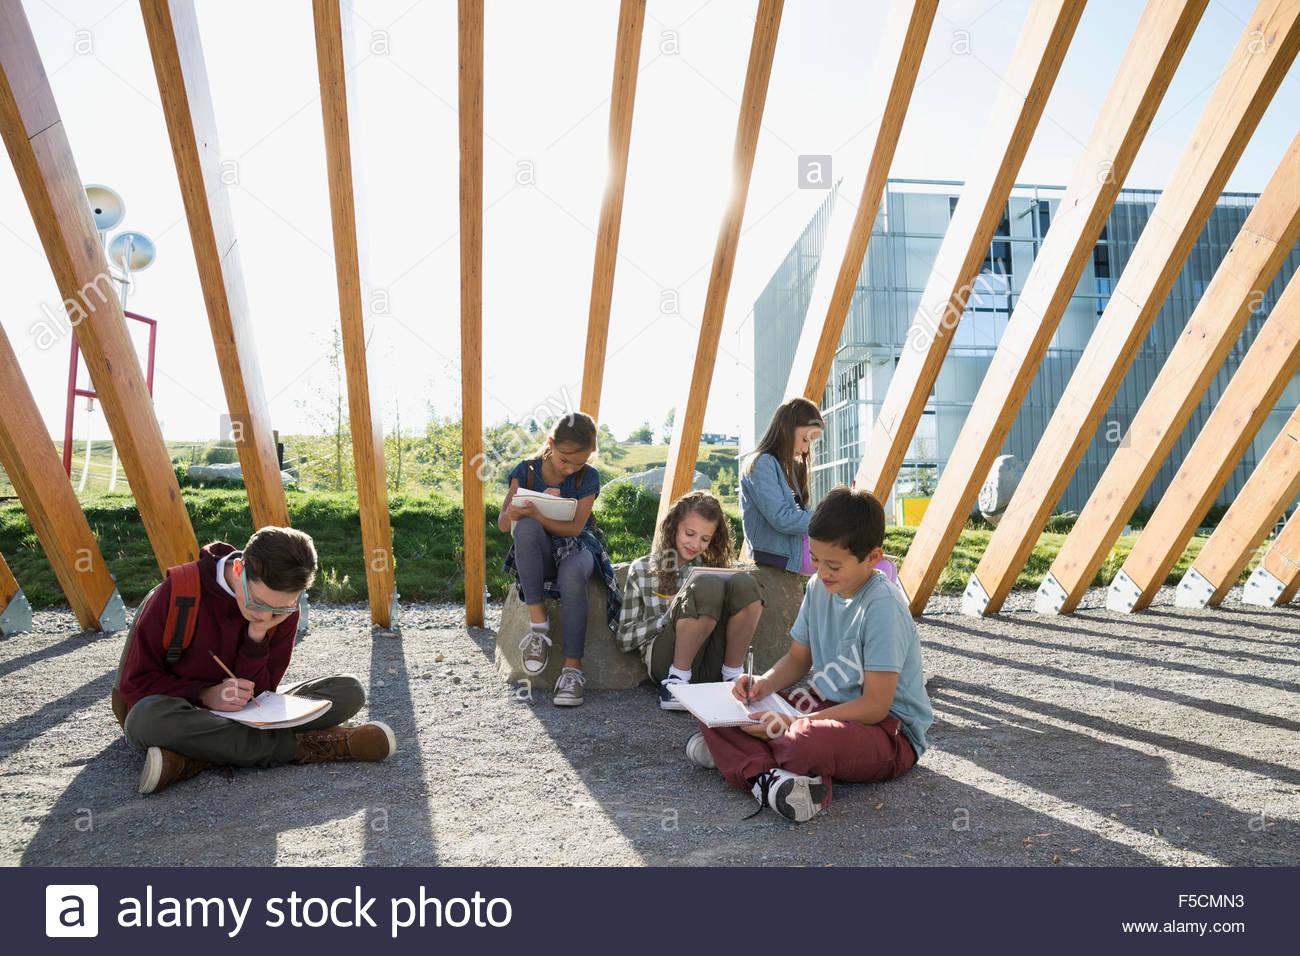 Students doing homework under wood beam walkway - Stock Image